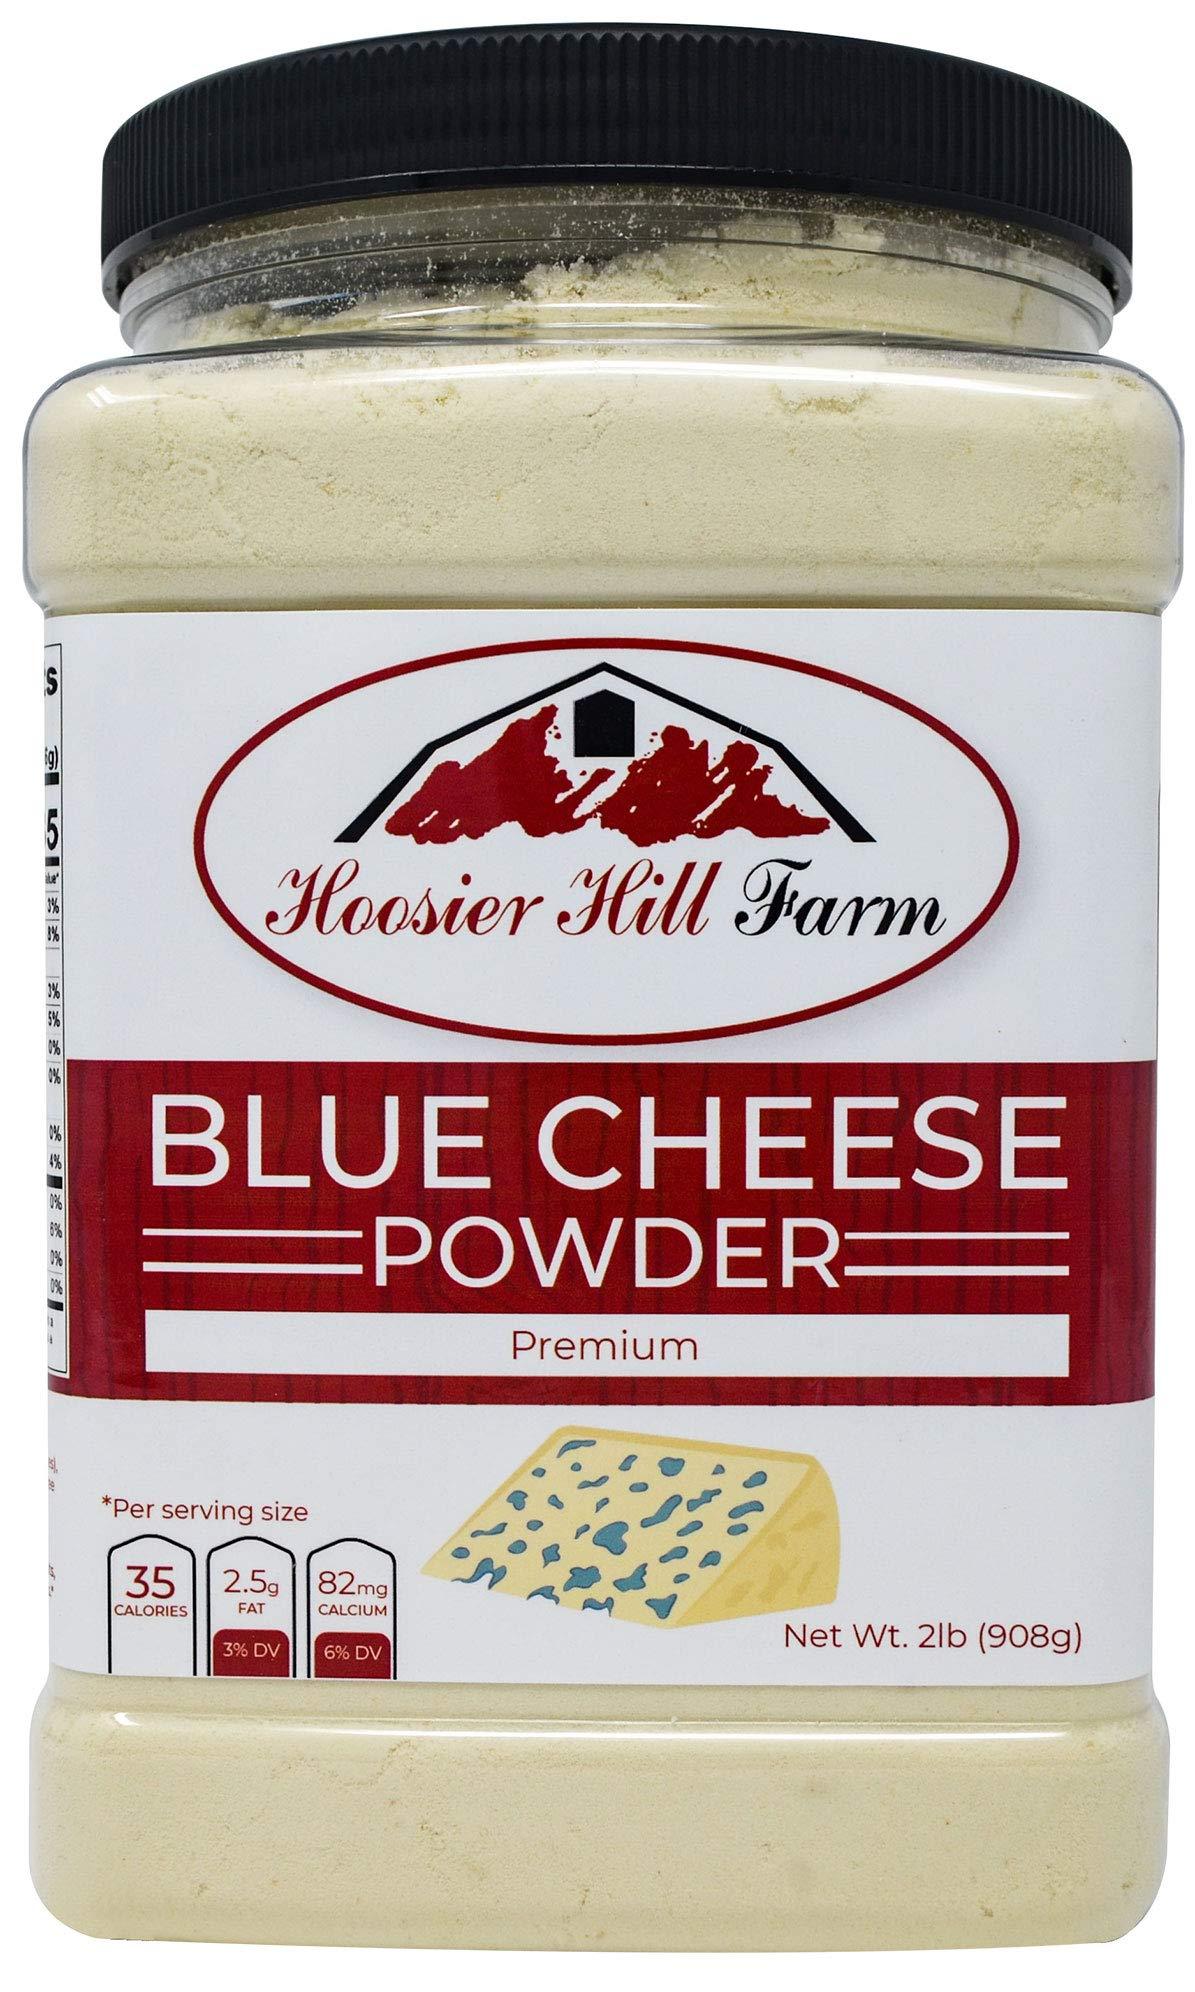 Blue Cheese Powder by Hoosier Hill Farm 2 lb, Hormone free by Hoosier Hill Farm